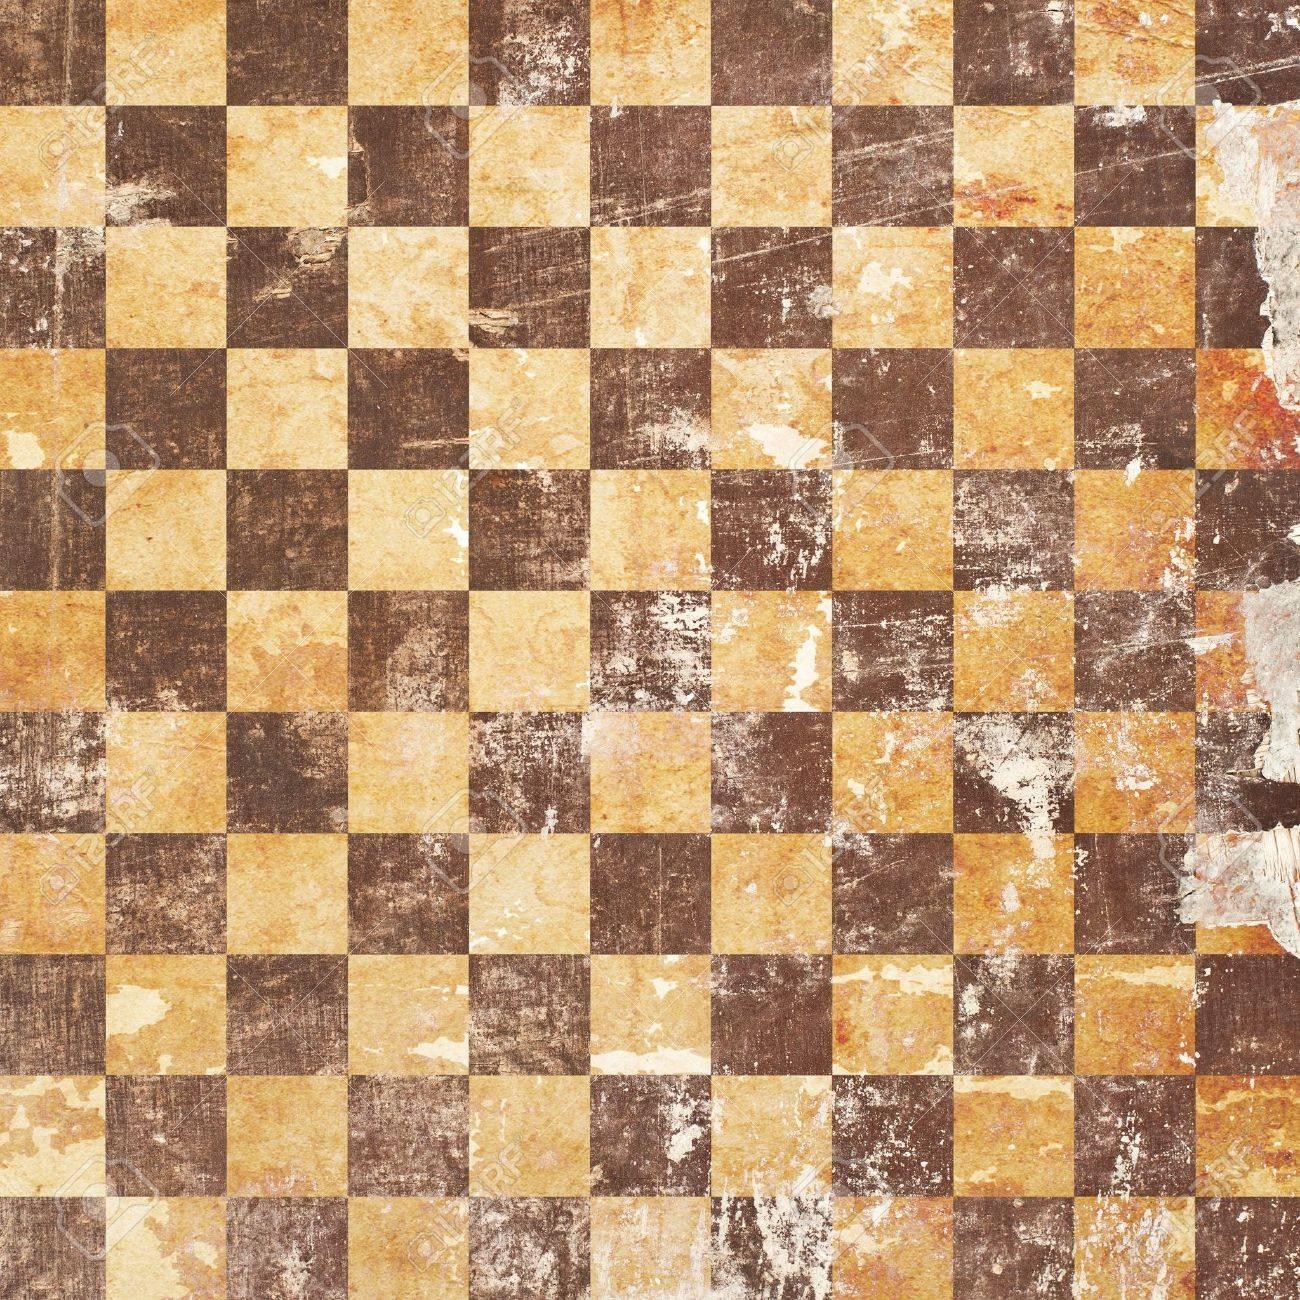 grunge chessboard backgound Stock Photo - 15666131